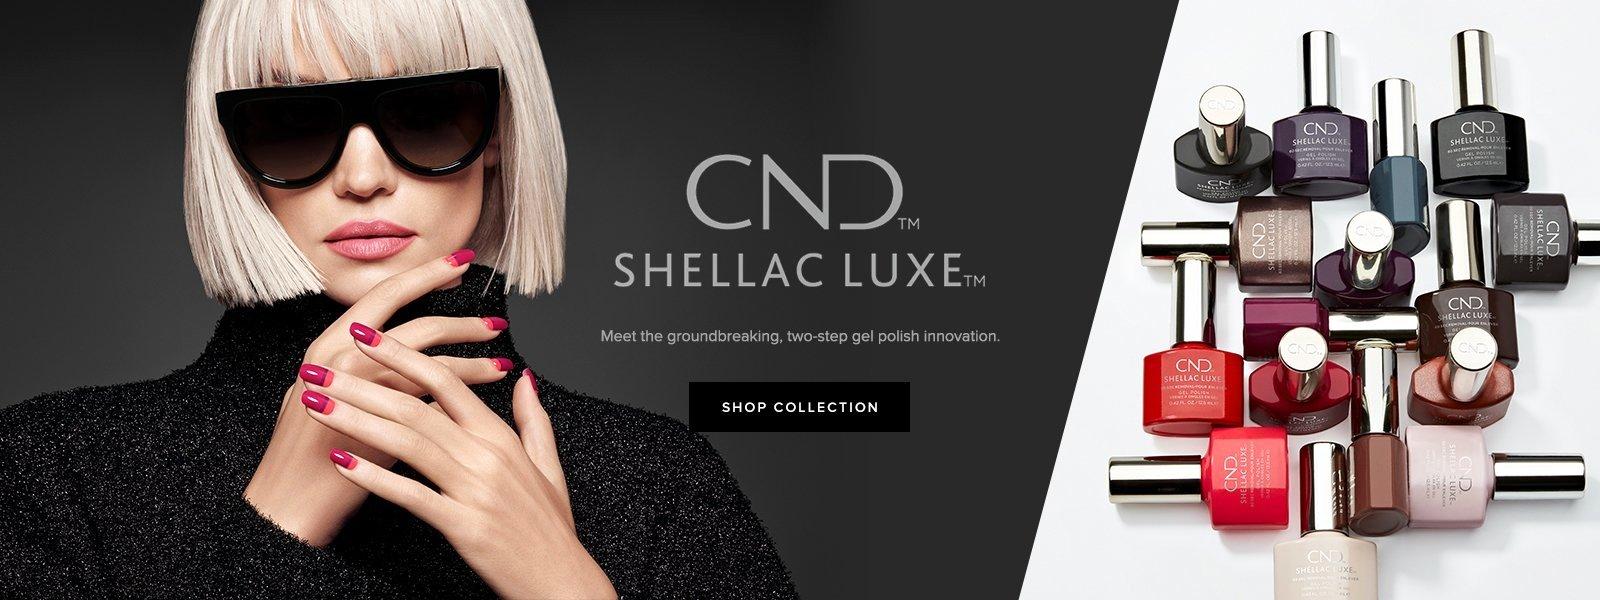 alle kleuren CND Shellac Luxe bij IMGRO Beauty